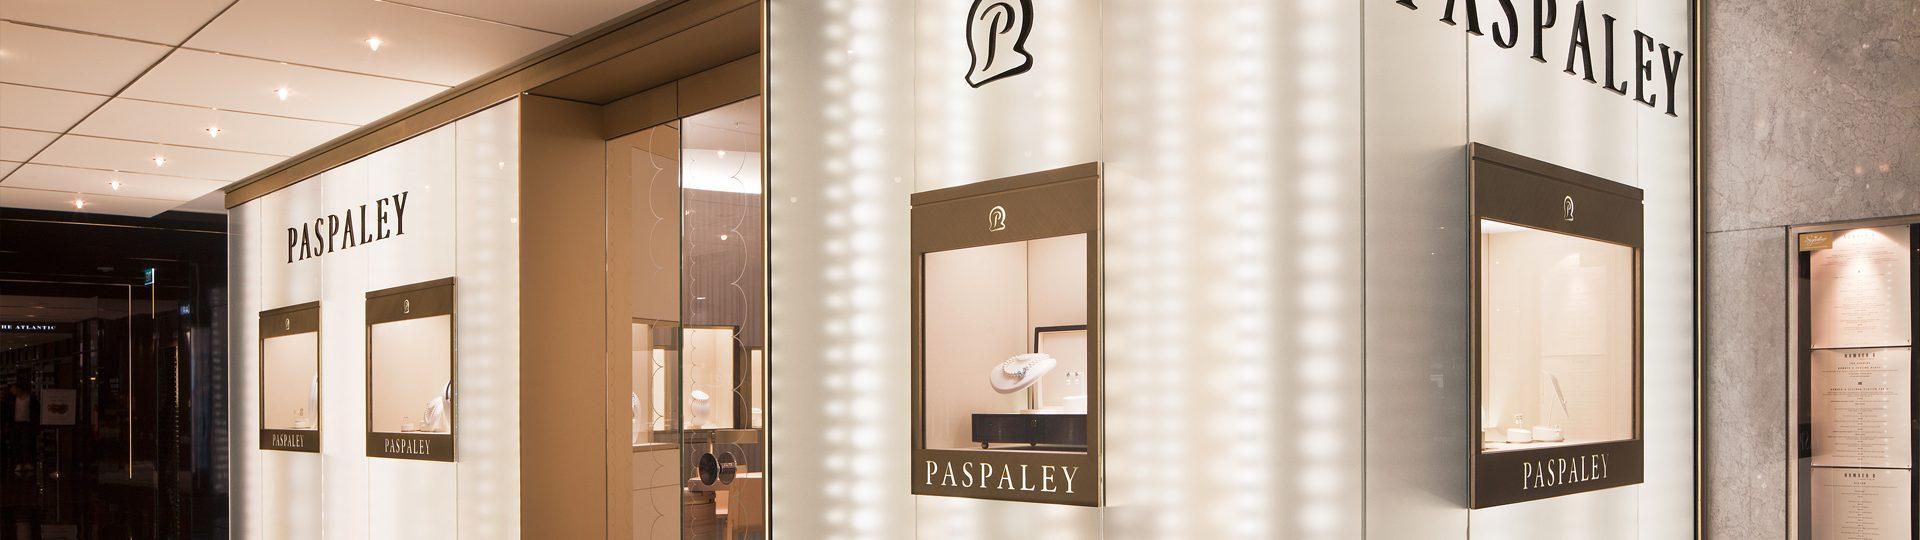 Specialist lighting design | Paspaley | The Light Lab